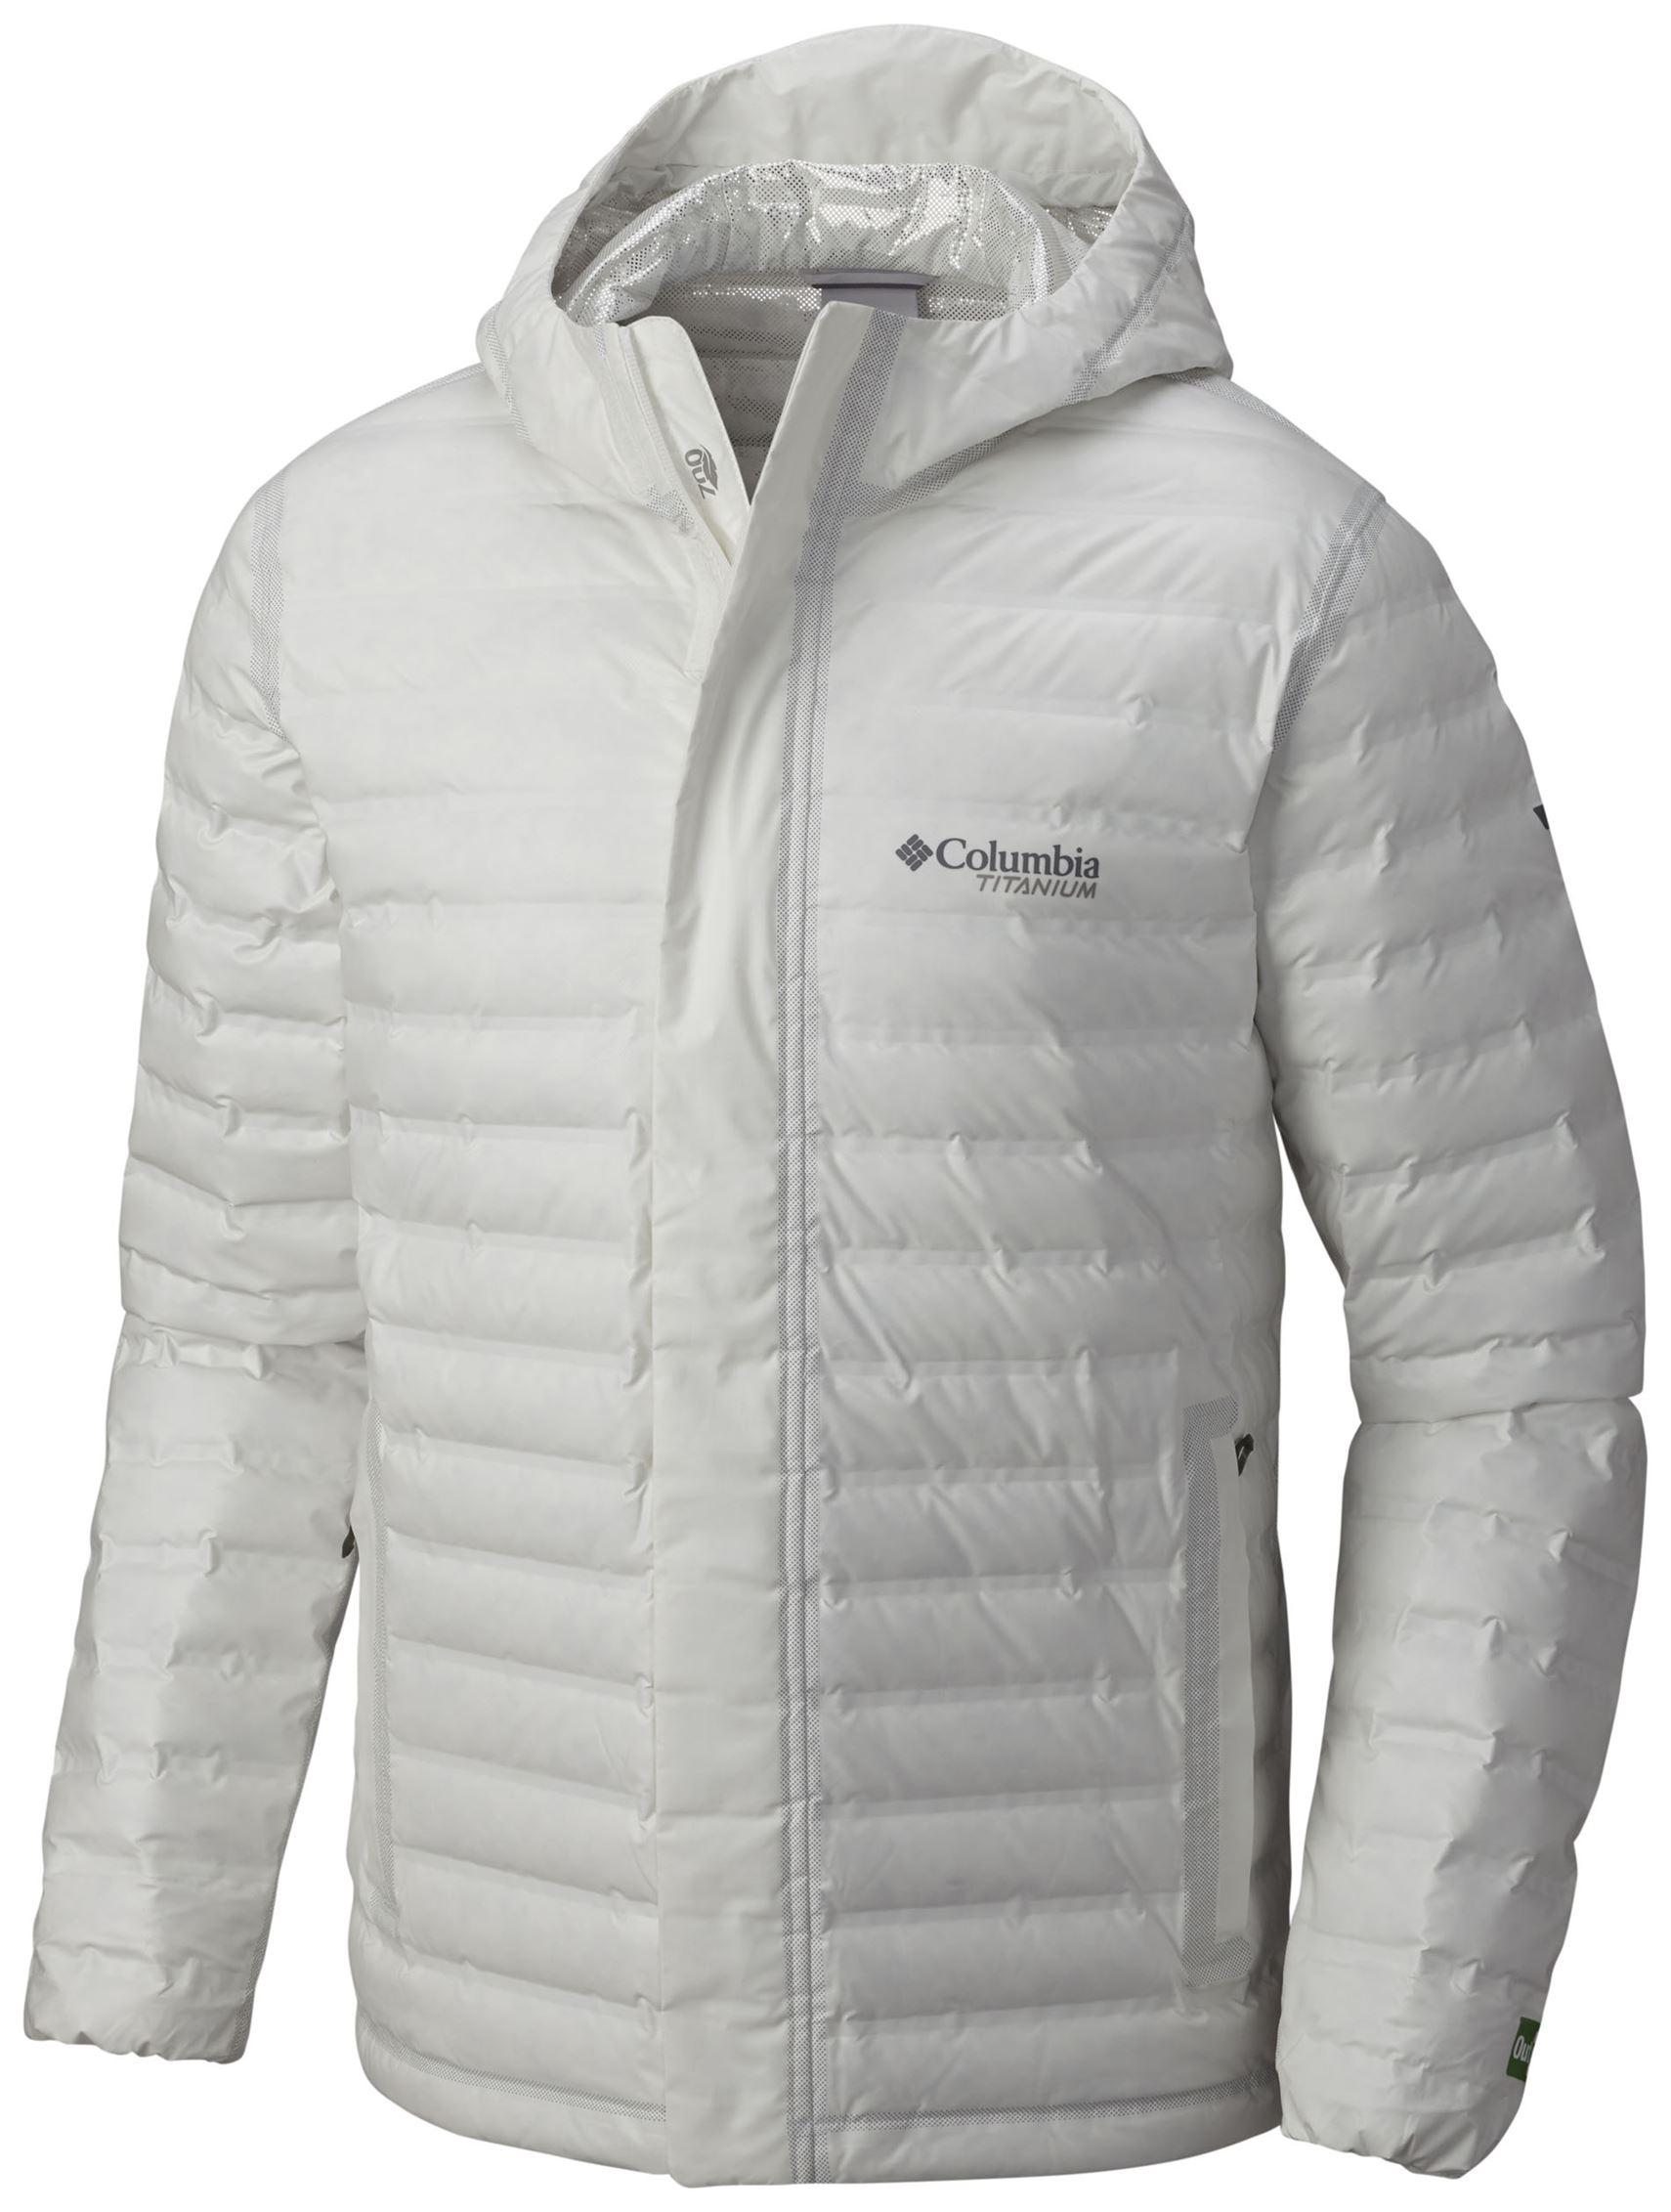 50a77ac2c RYAN REPORT: Columbia Outdry Ex Eco Down Jacket/ Ski Canada Magazine